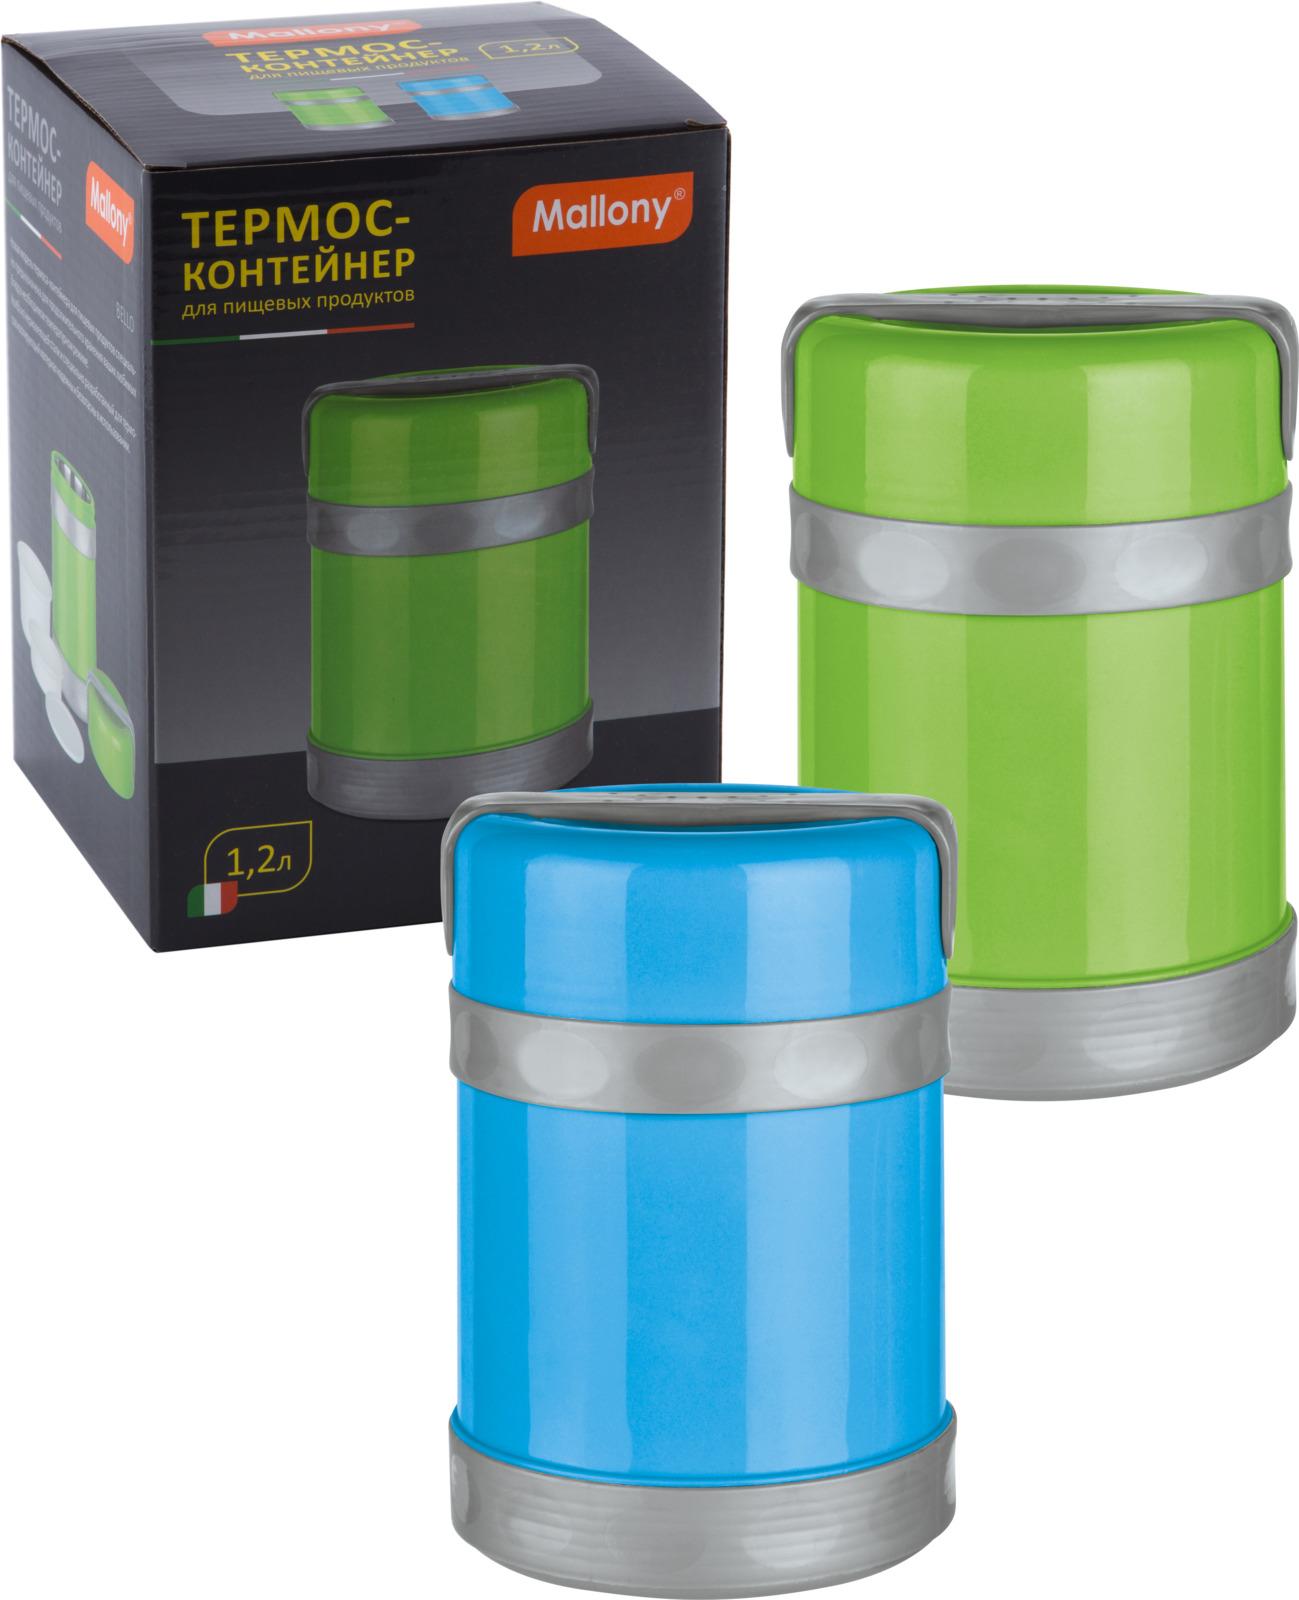 Термос-контейнер Mallony Bello, цвет: зеленый, синий, 1,2 л